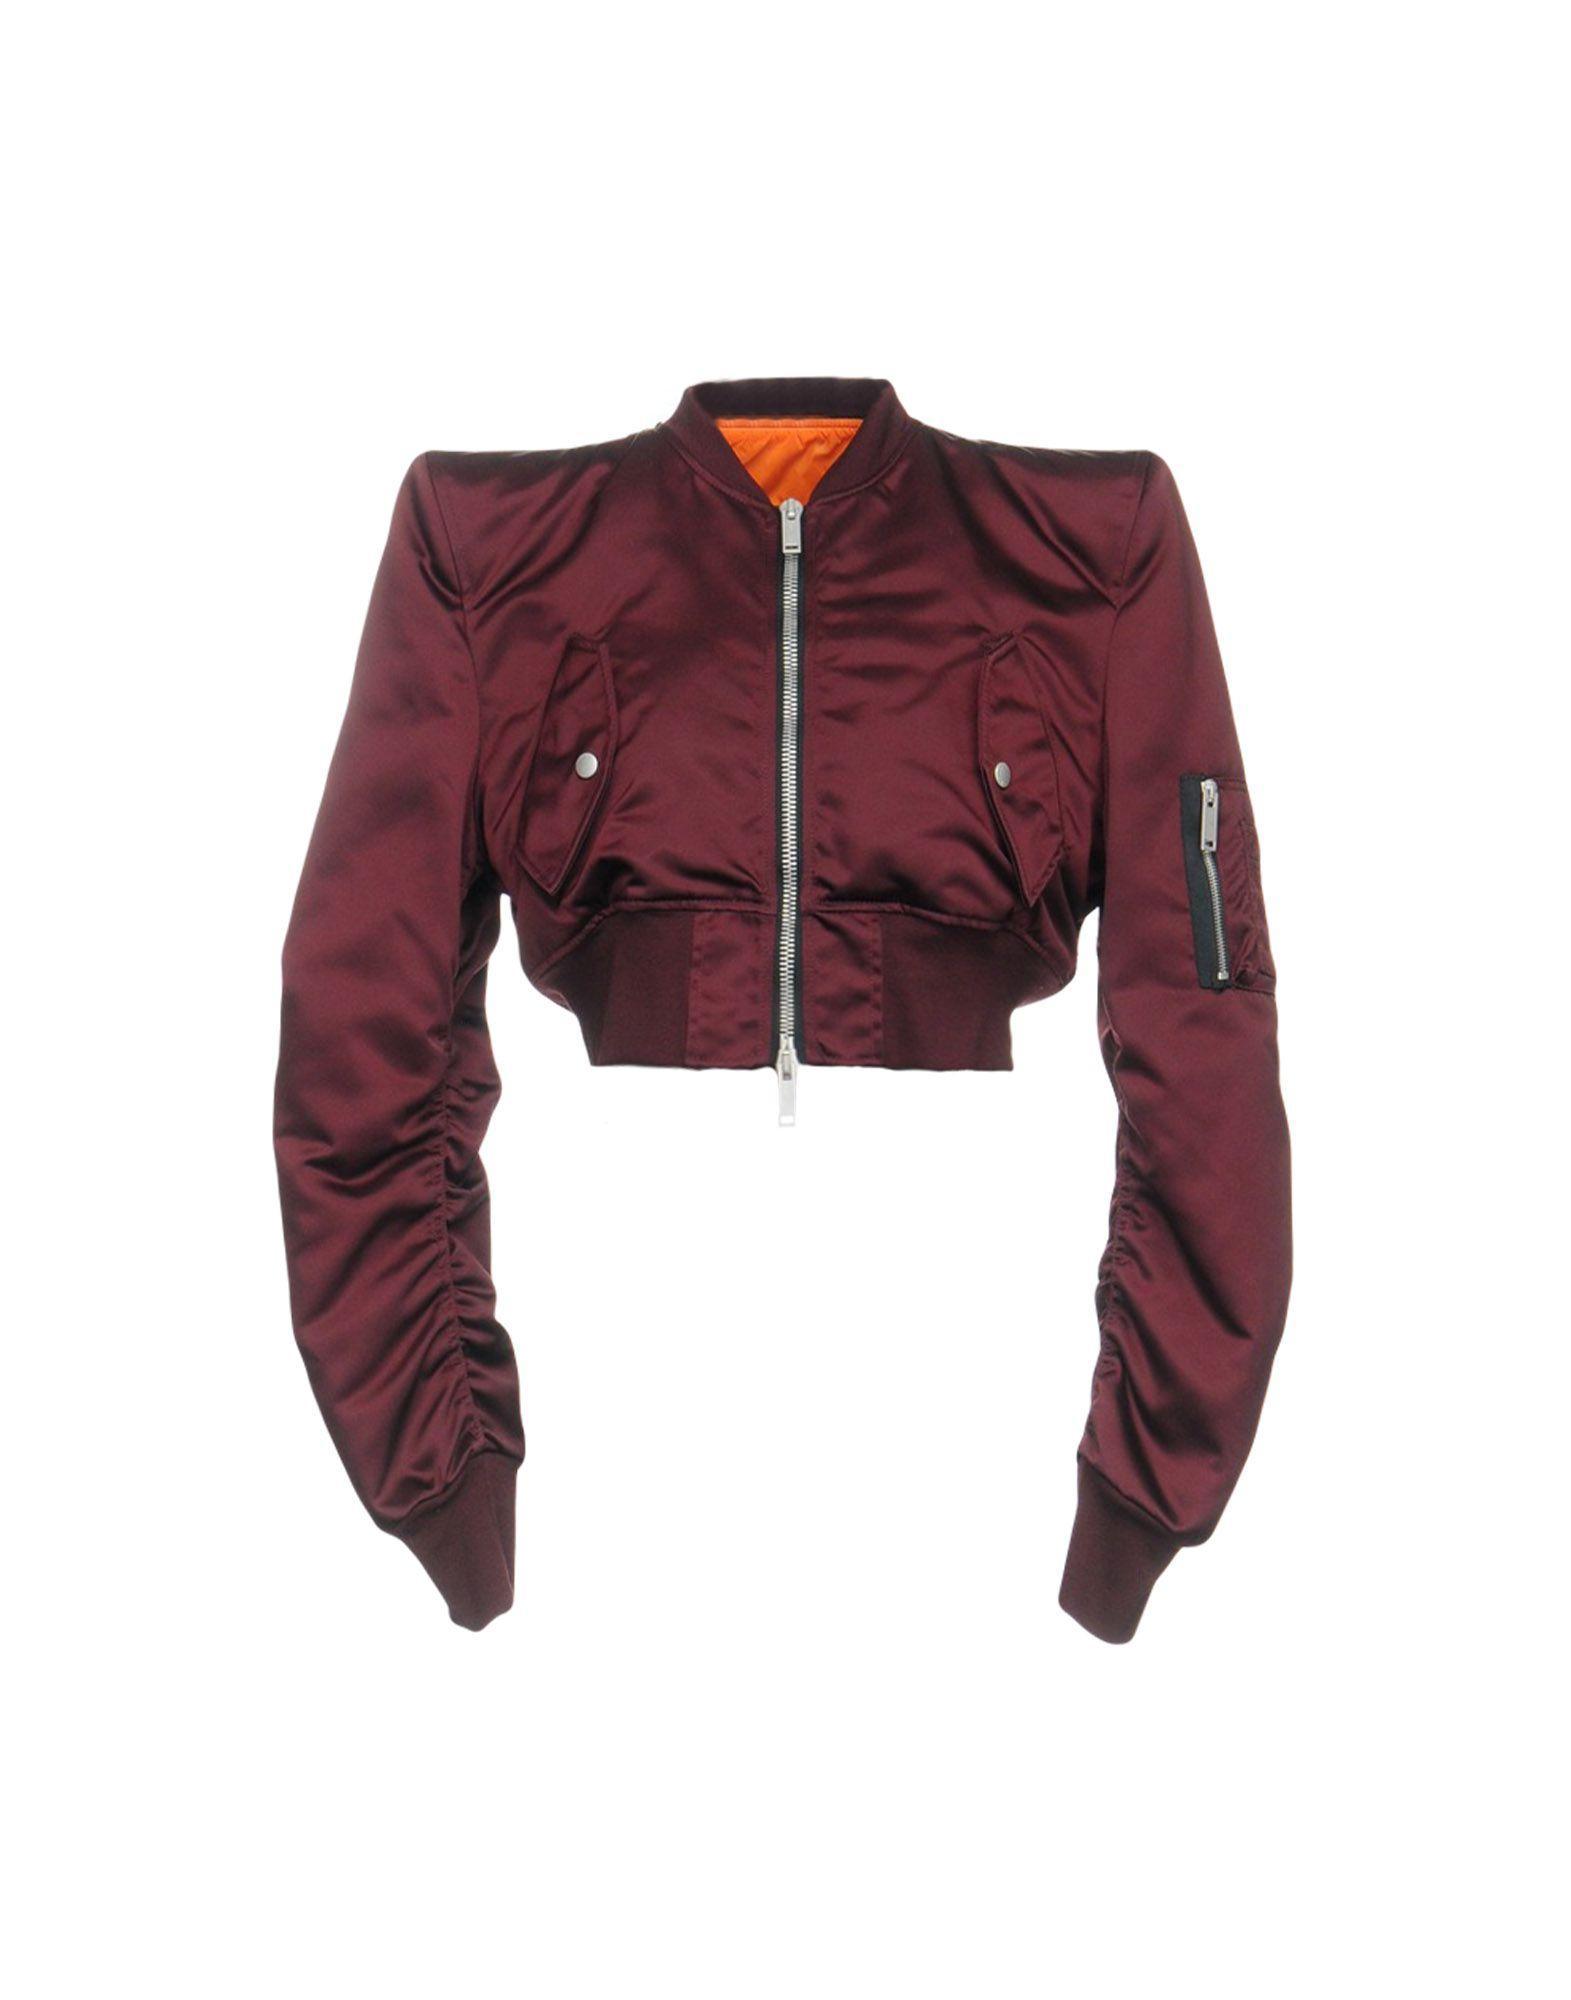 Ben Taverniti Unravel Project Ben Taverniti™ Unravel Project Jackets In Maroon